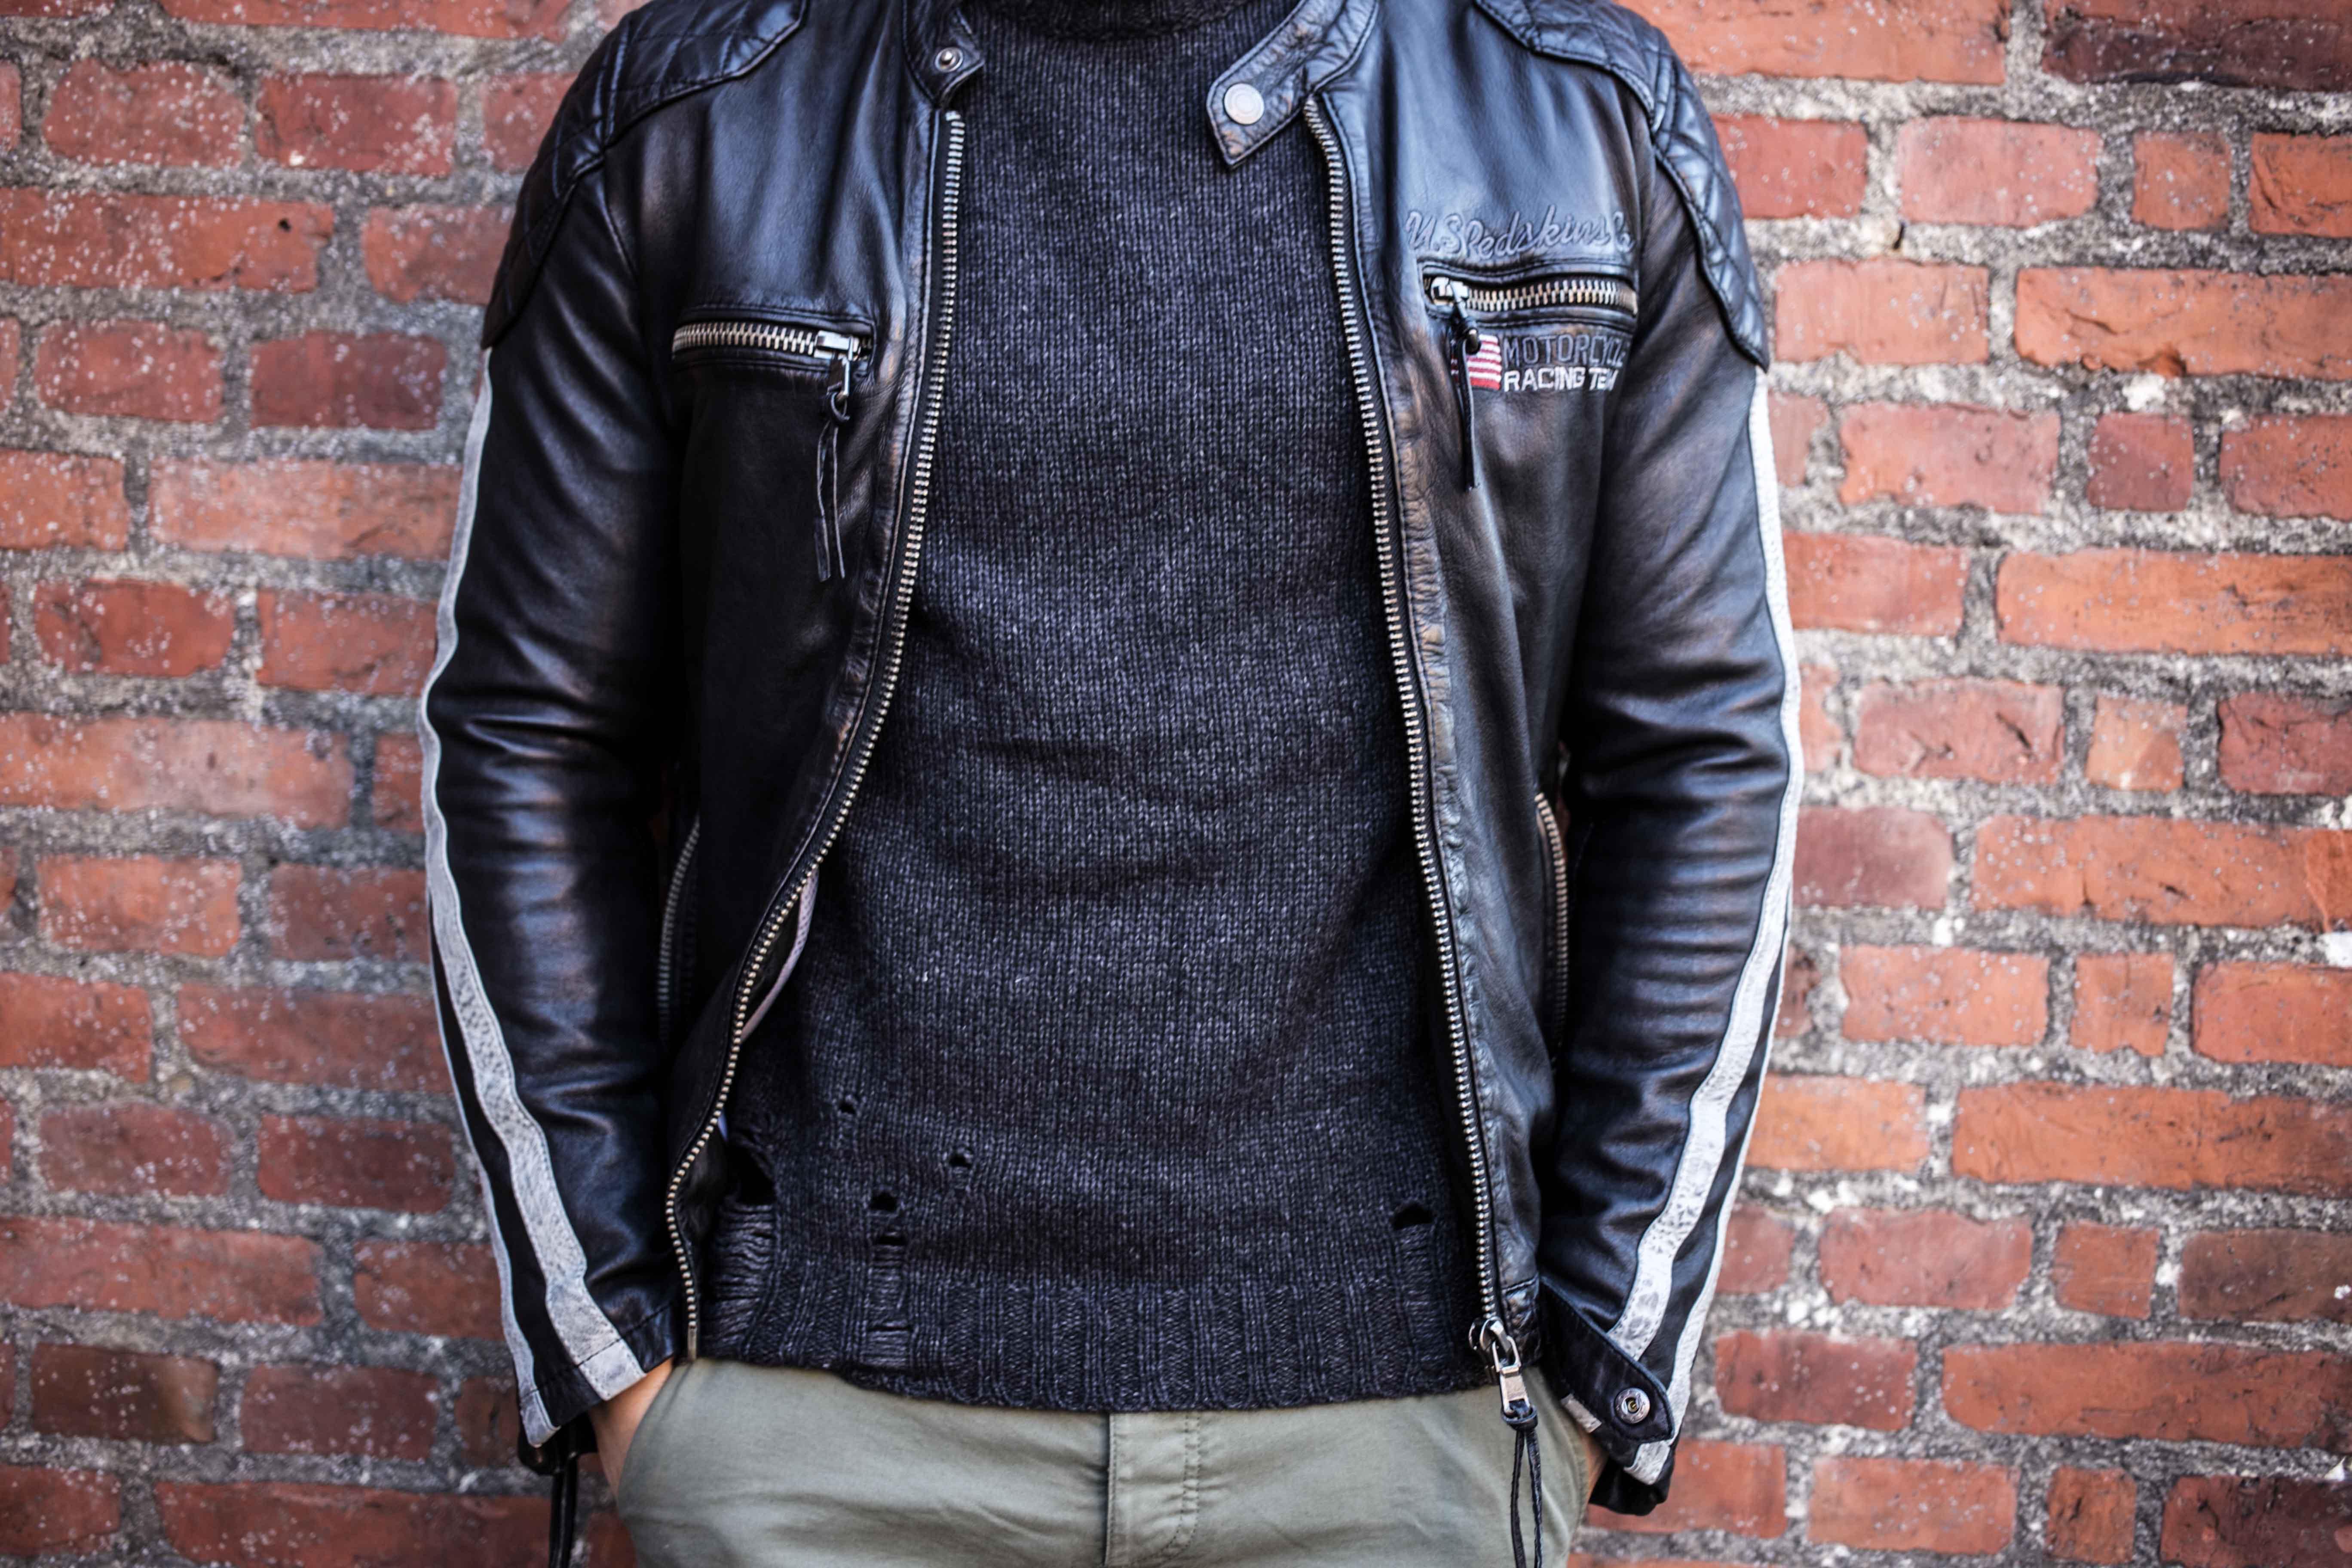 trashed-pullover-schwarze-lederjacke-olivgruene-chino-grunge-look_6076